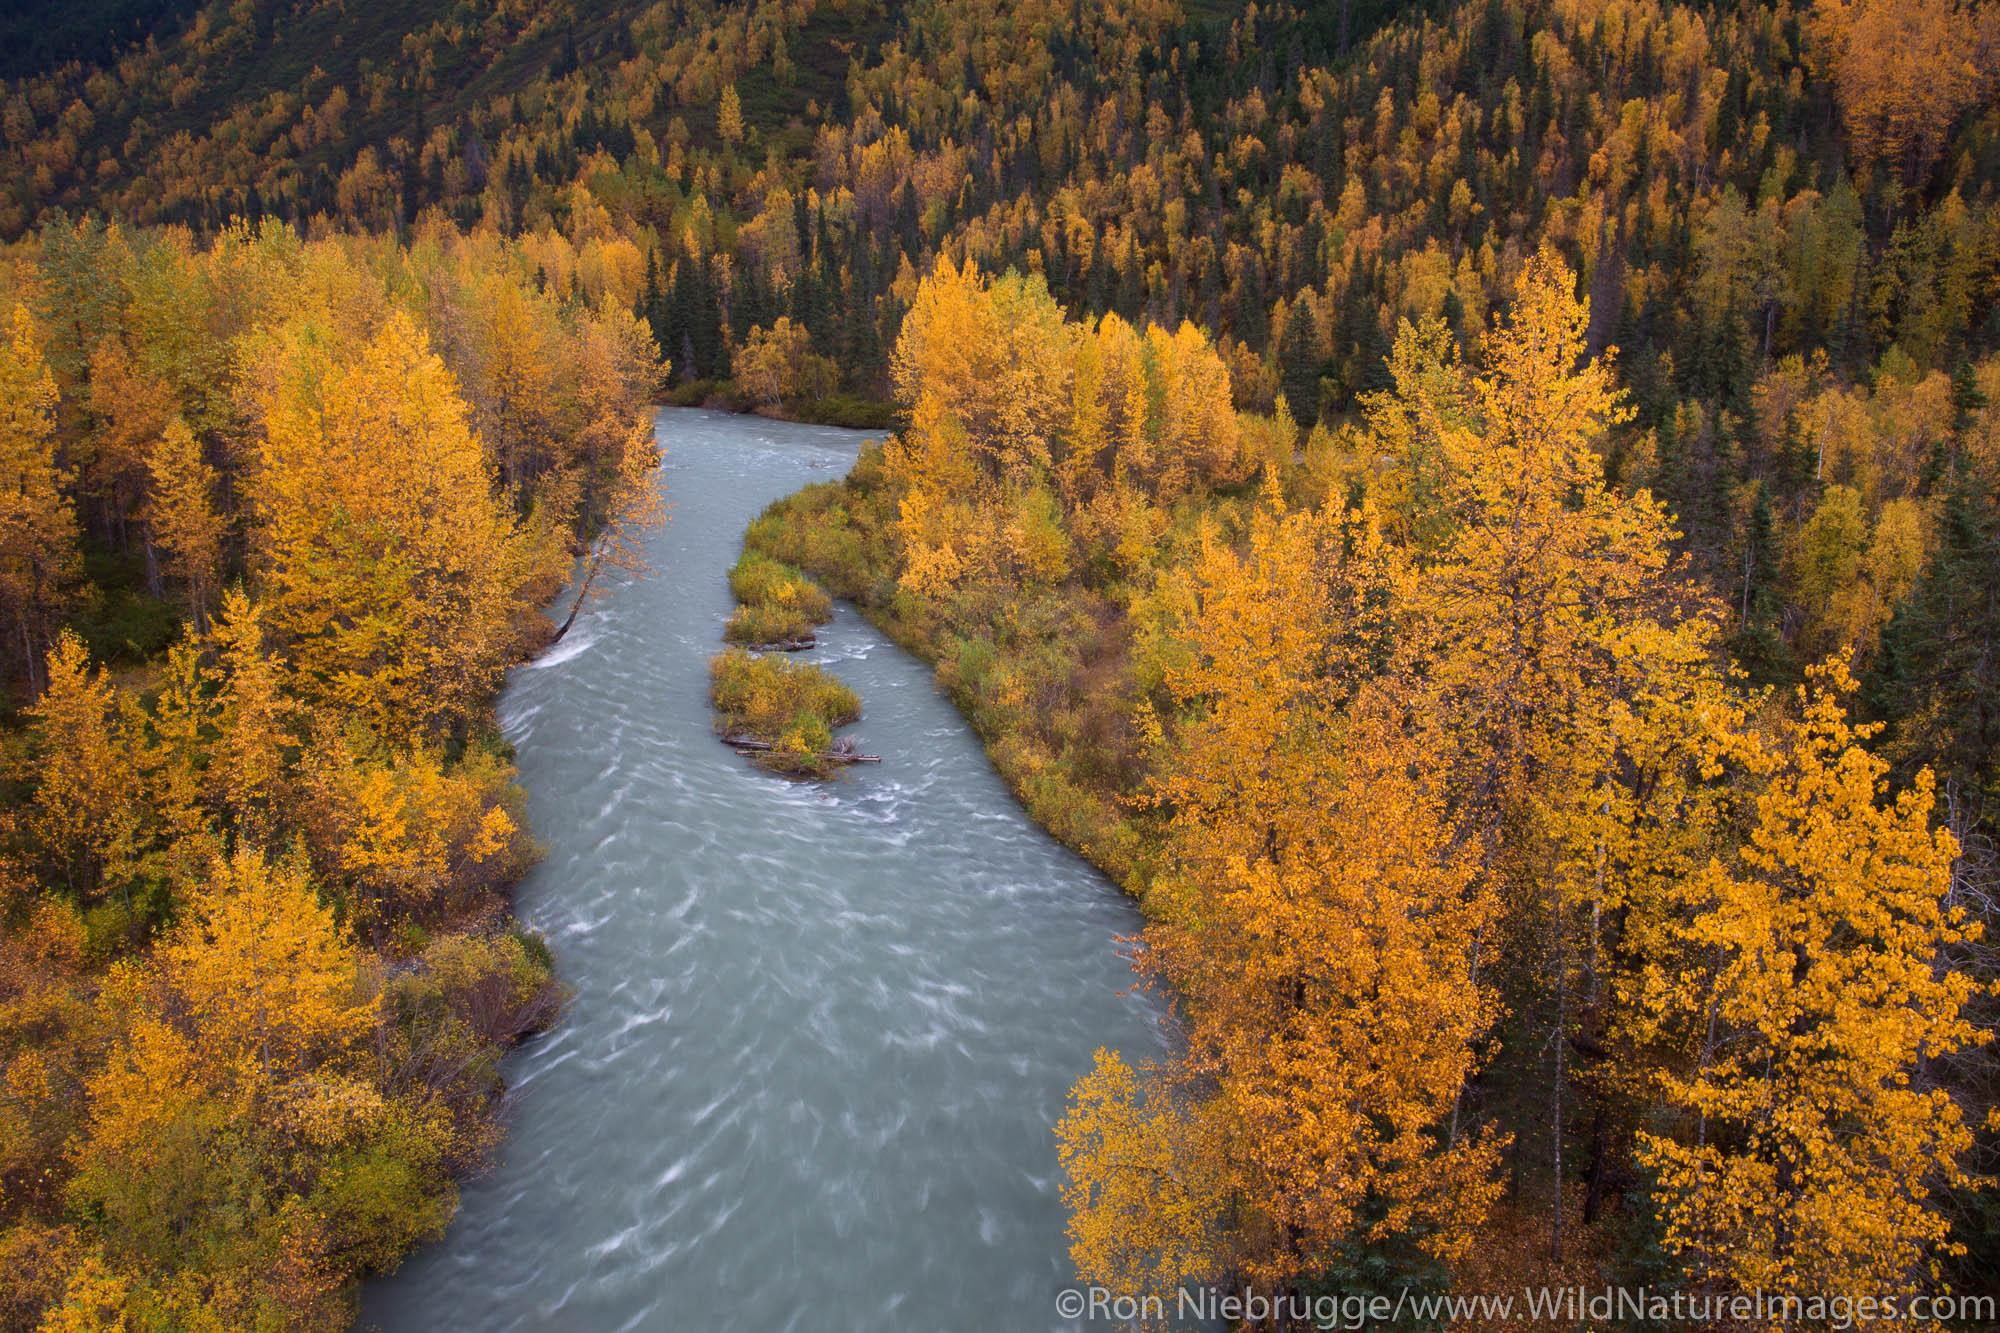 Autumn colors at Canyon Creek, Chugach National Forest, Alaska.